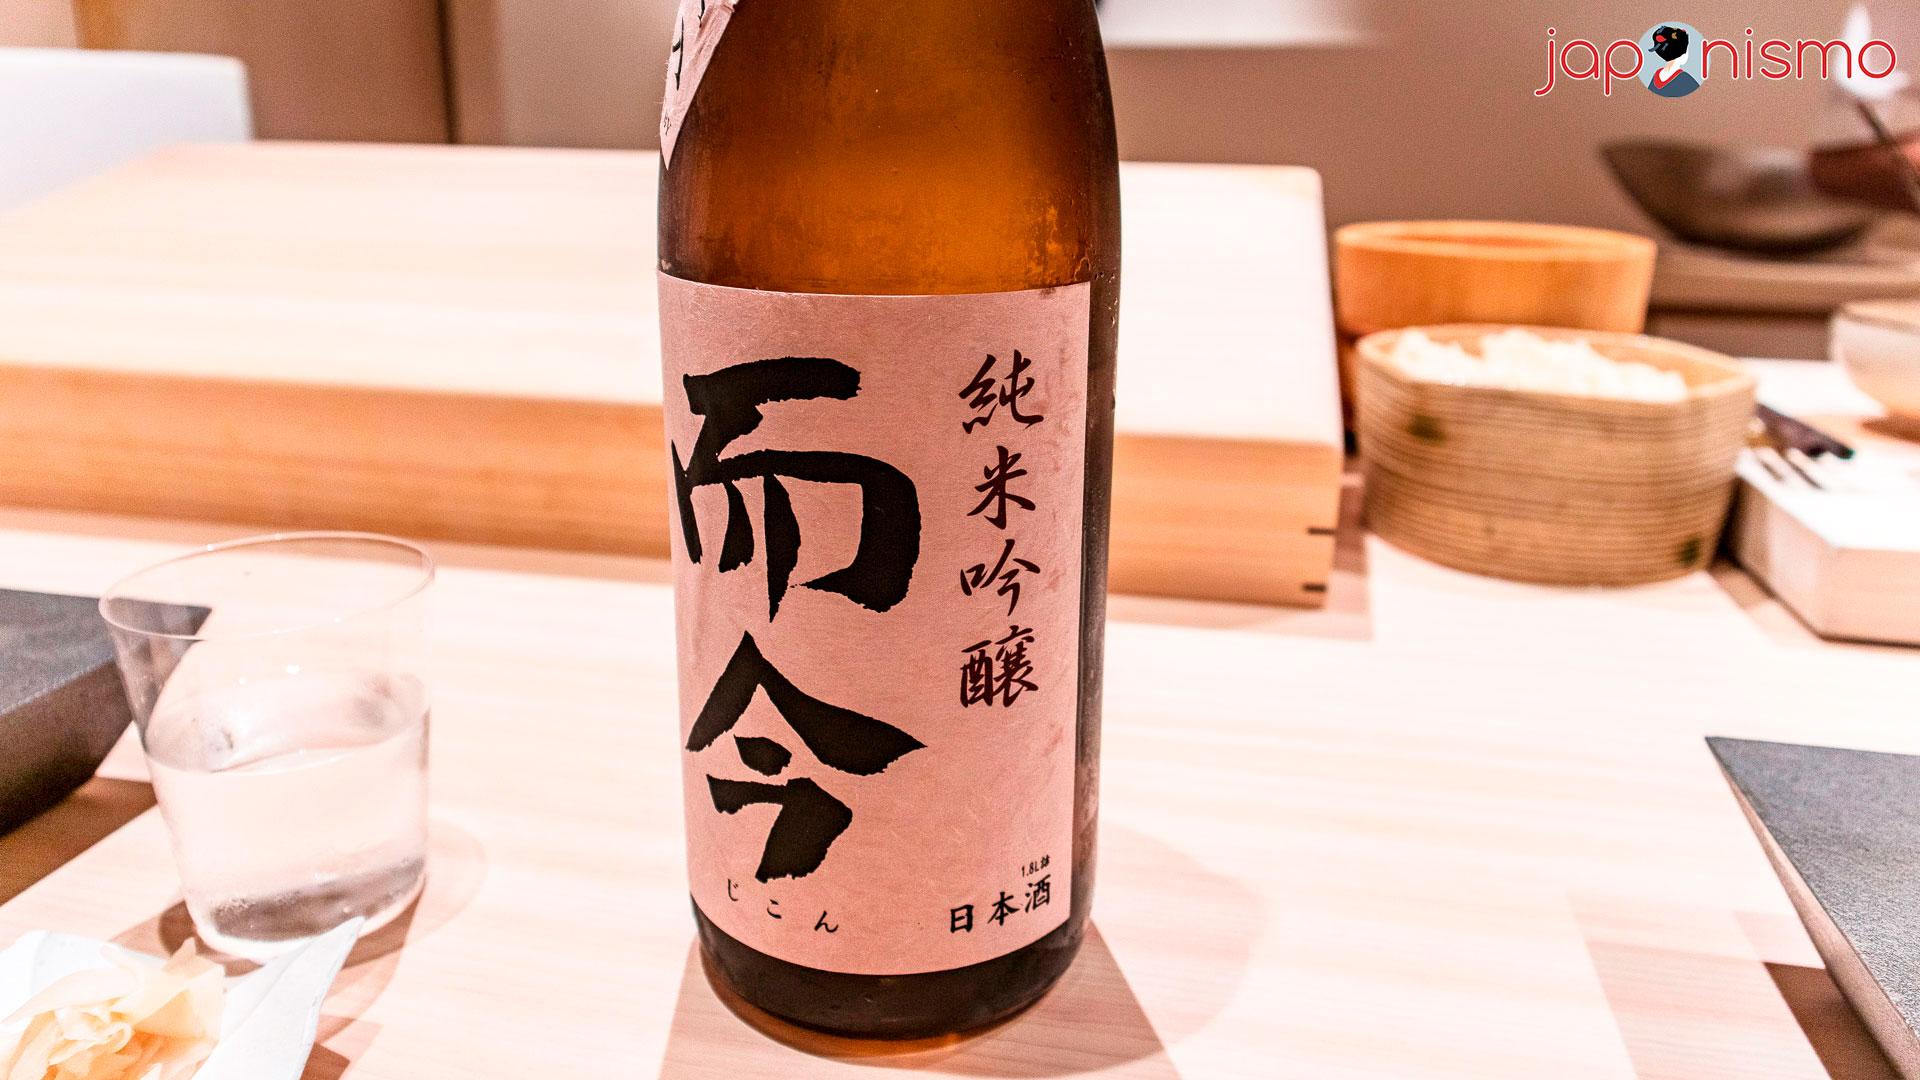 ingredientes japón hero asset